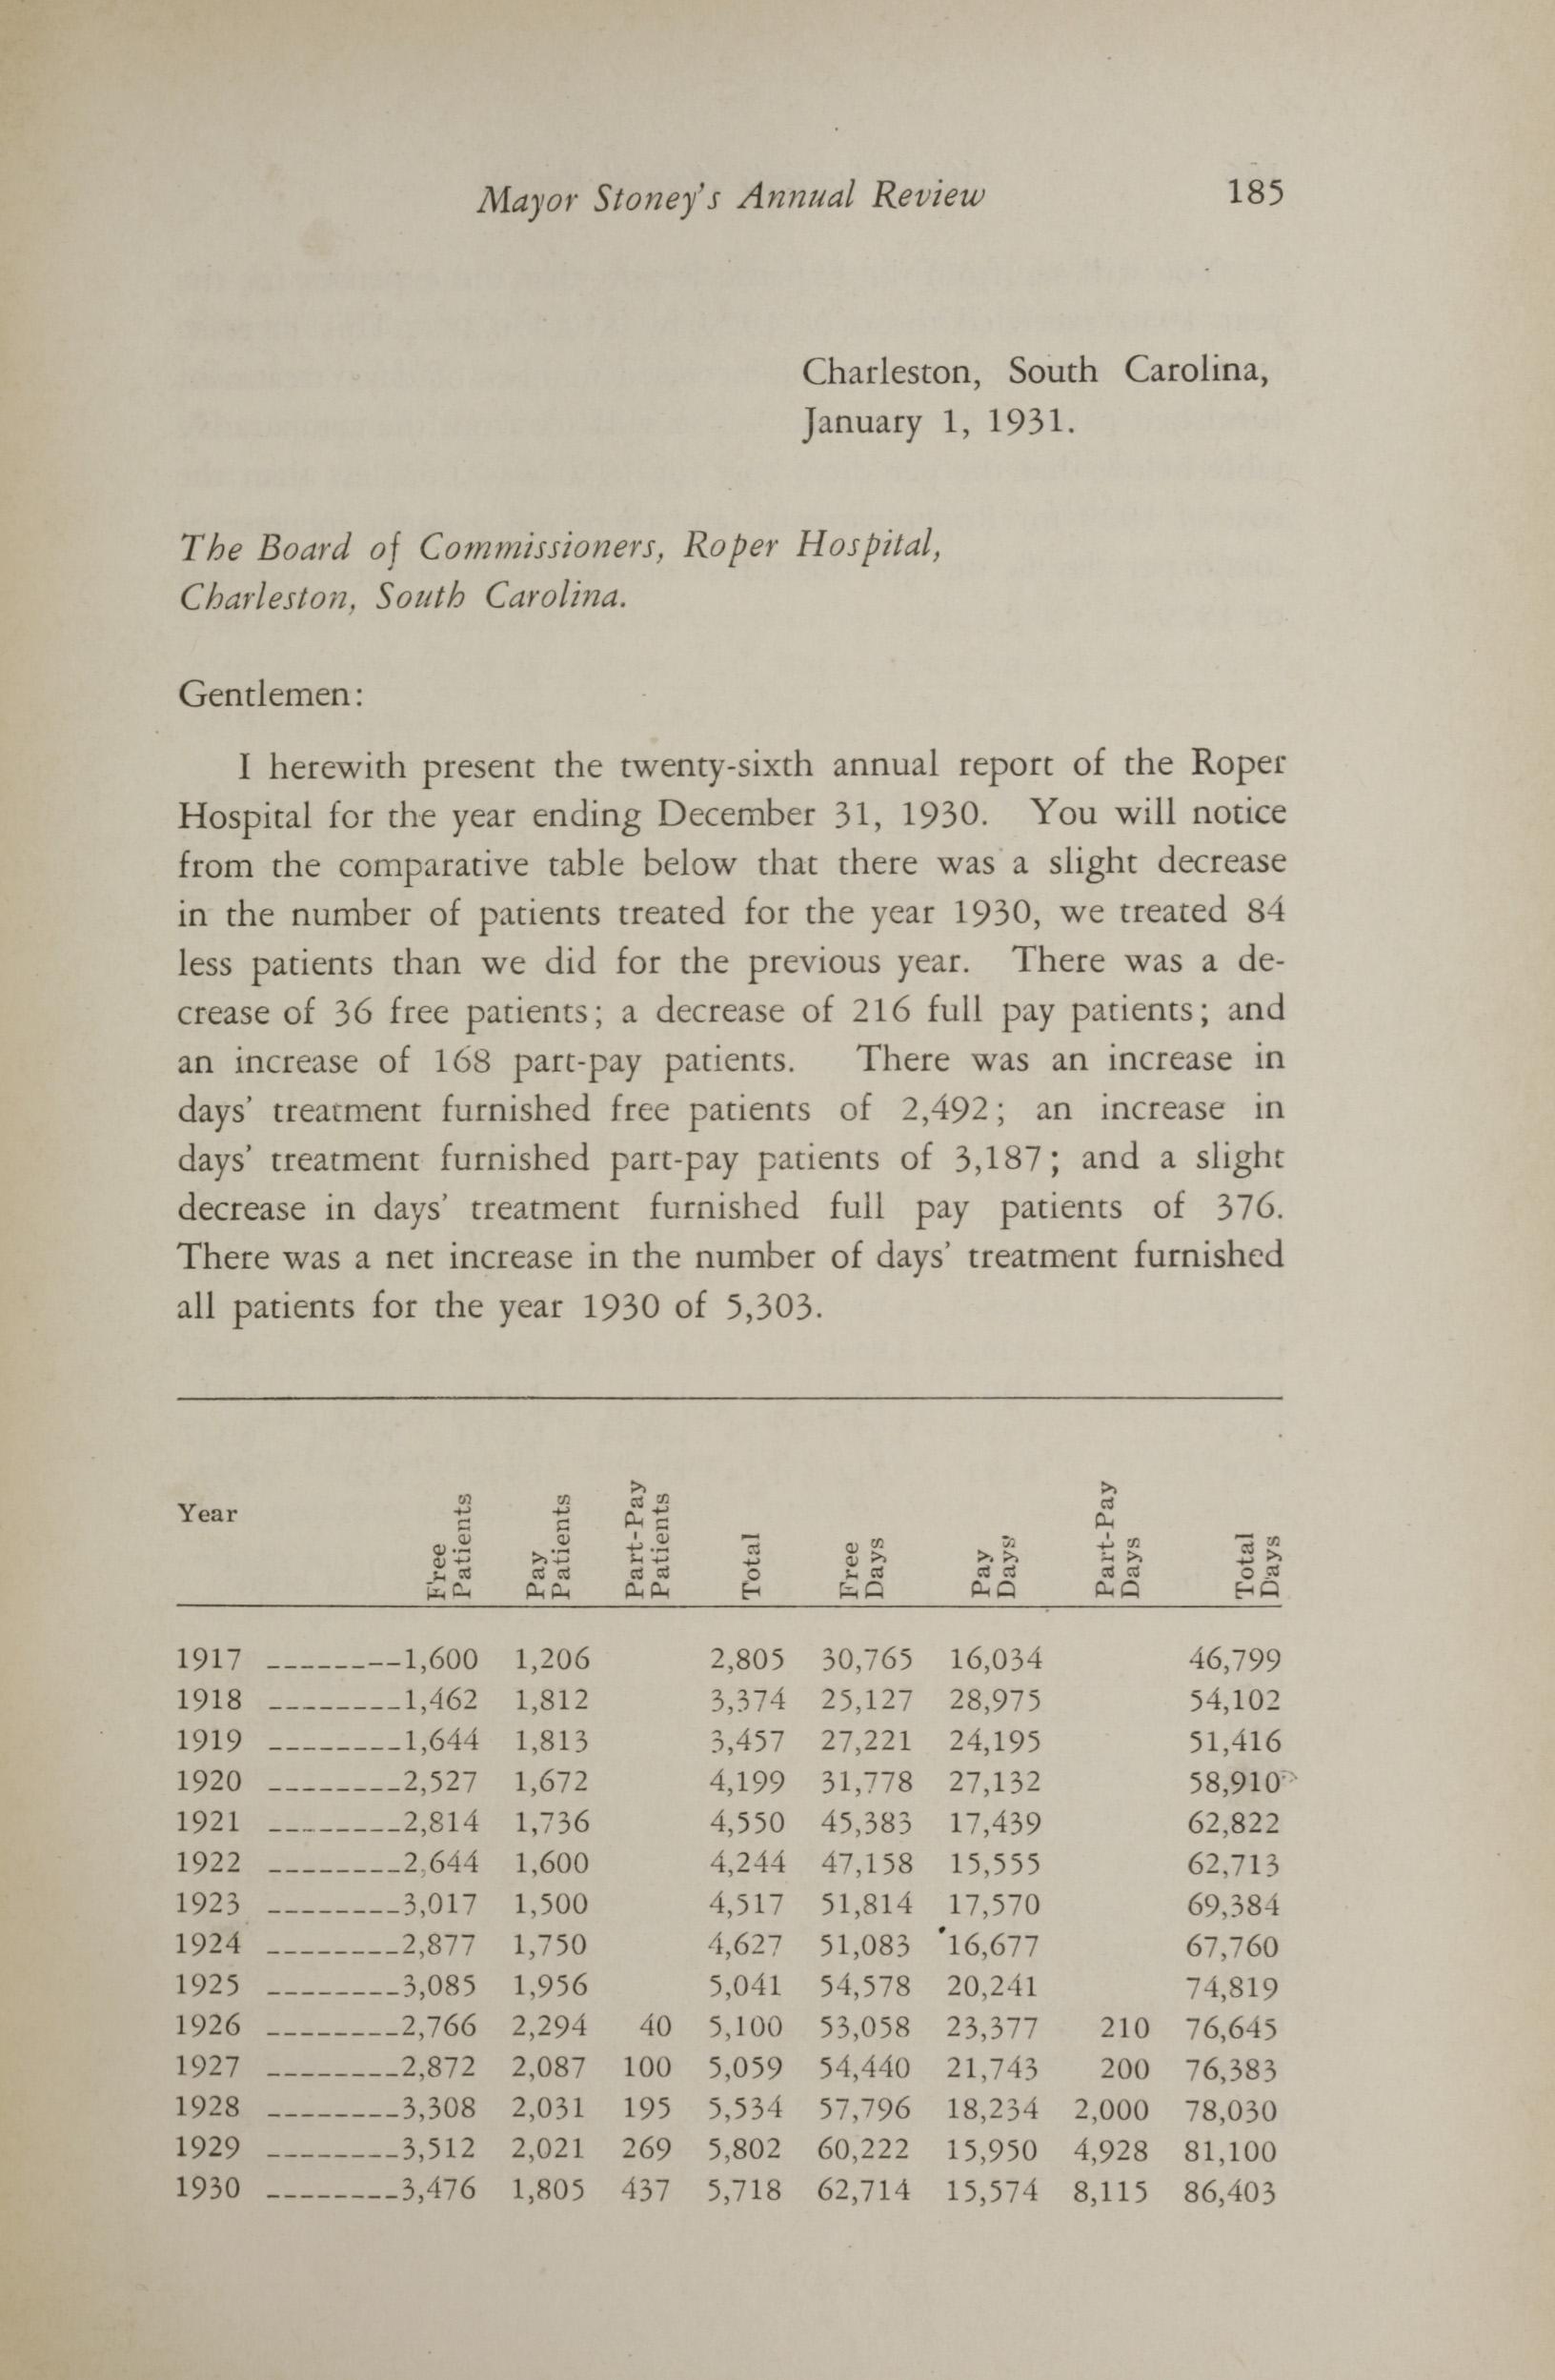 Charleston Yearbook, 1930, page 185